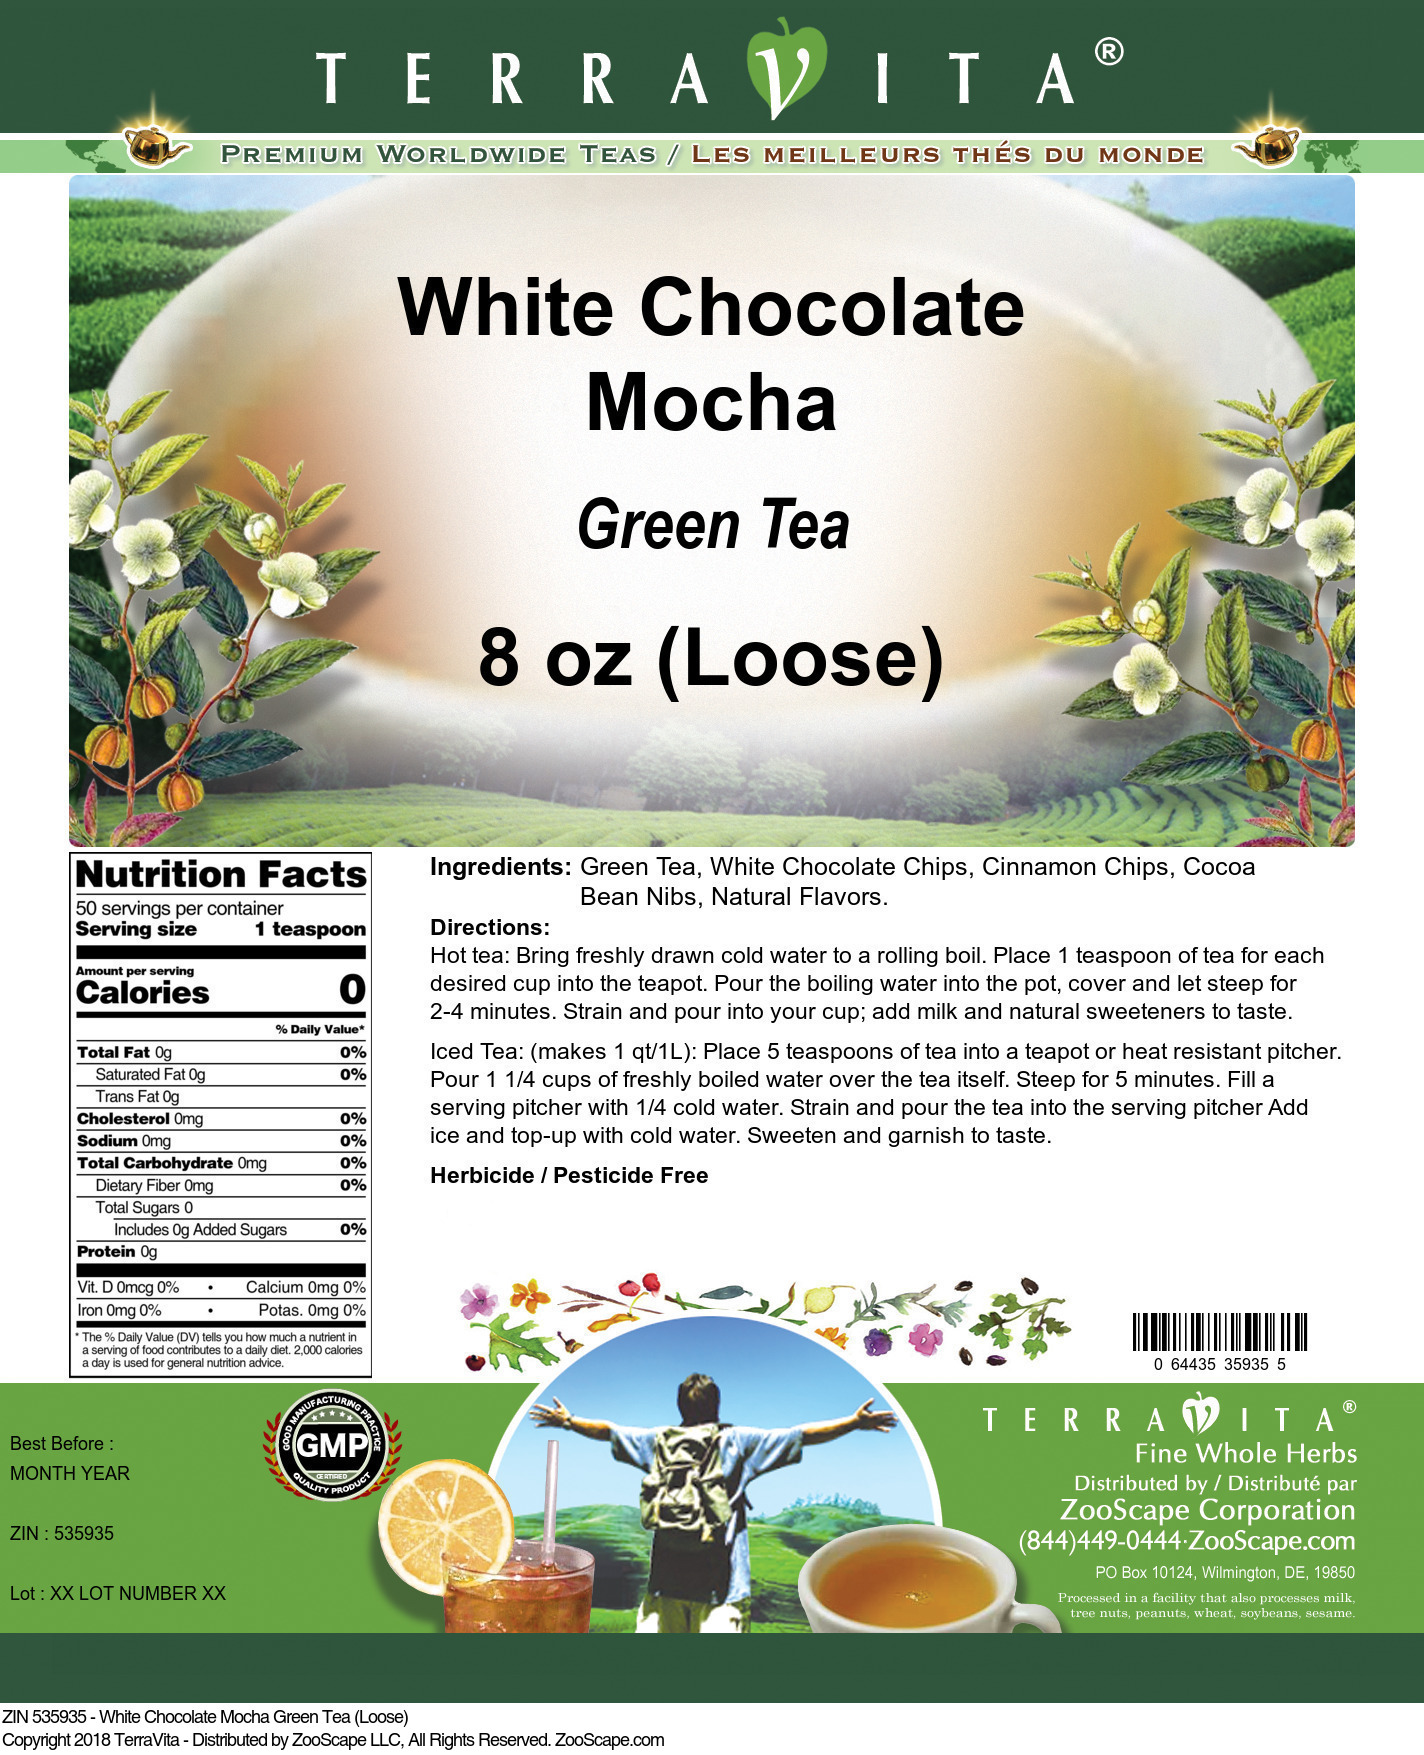 White Chocolate Mocha Green Tea